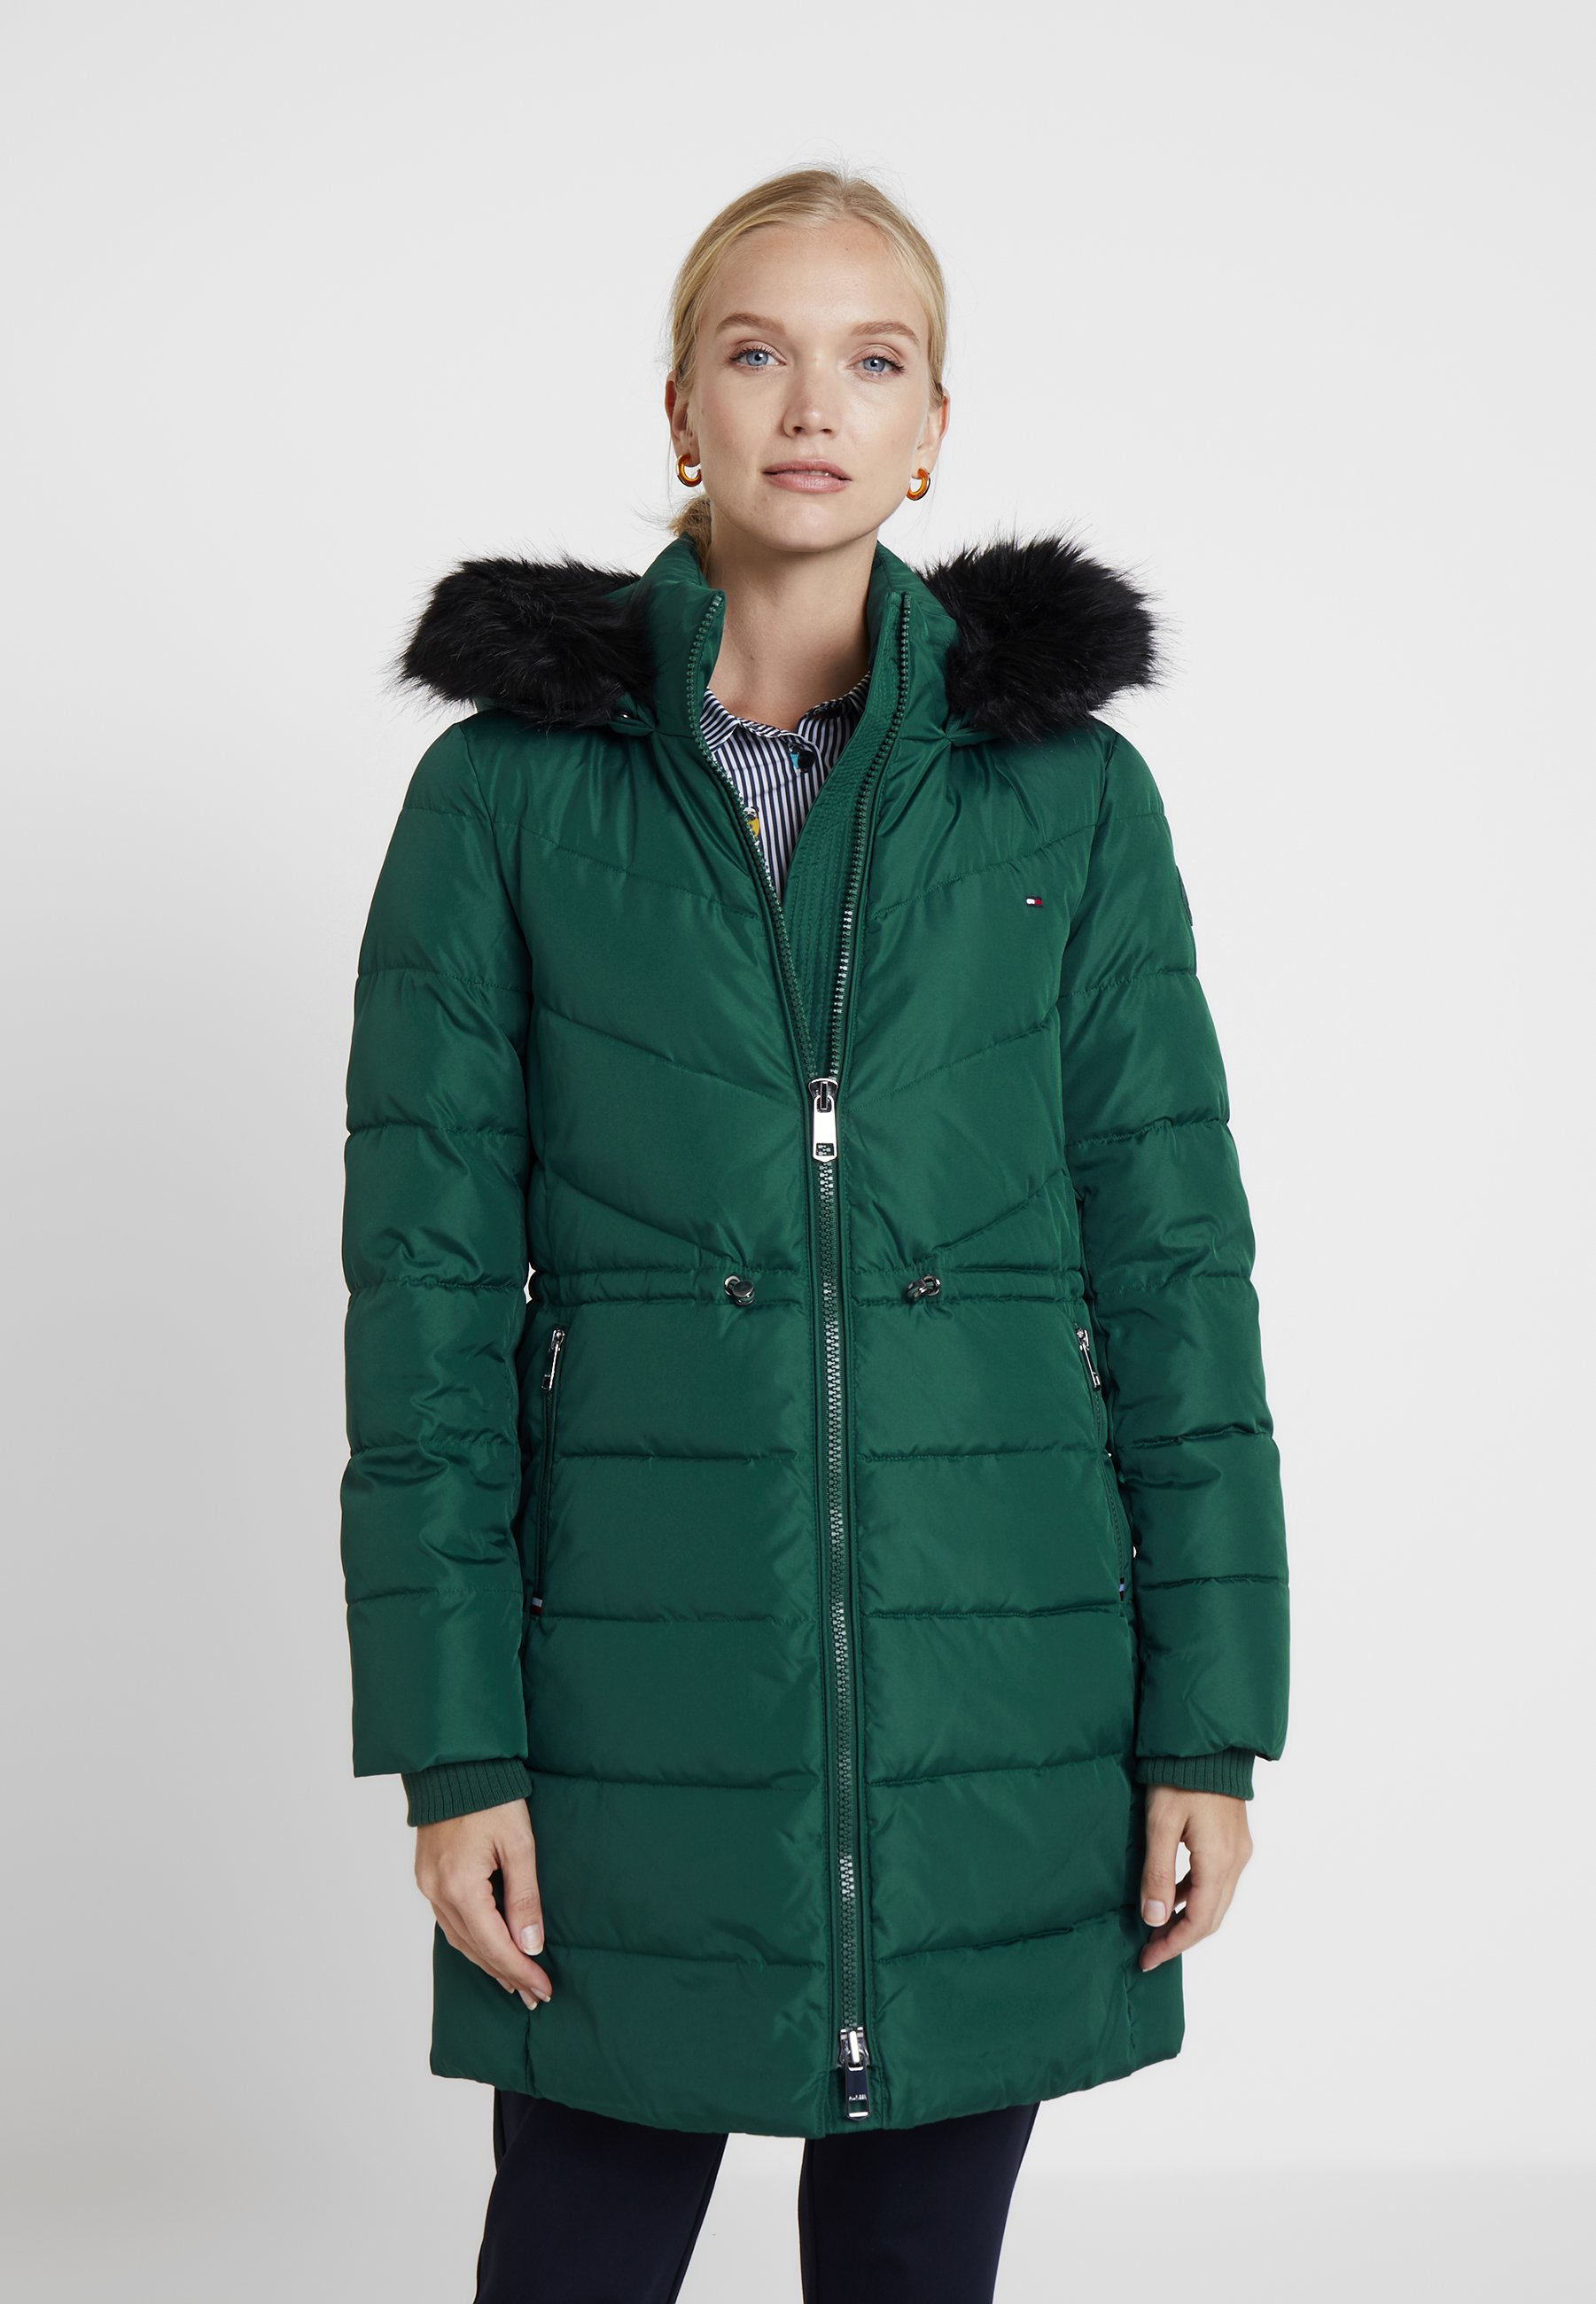 Boda esperanza Orador  Tommy Hilfiger ALANA PADDED COAT - Winter coat - green - Zalando.co.uk